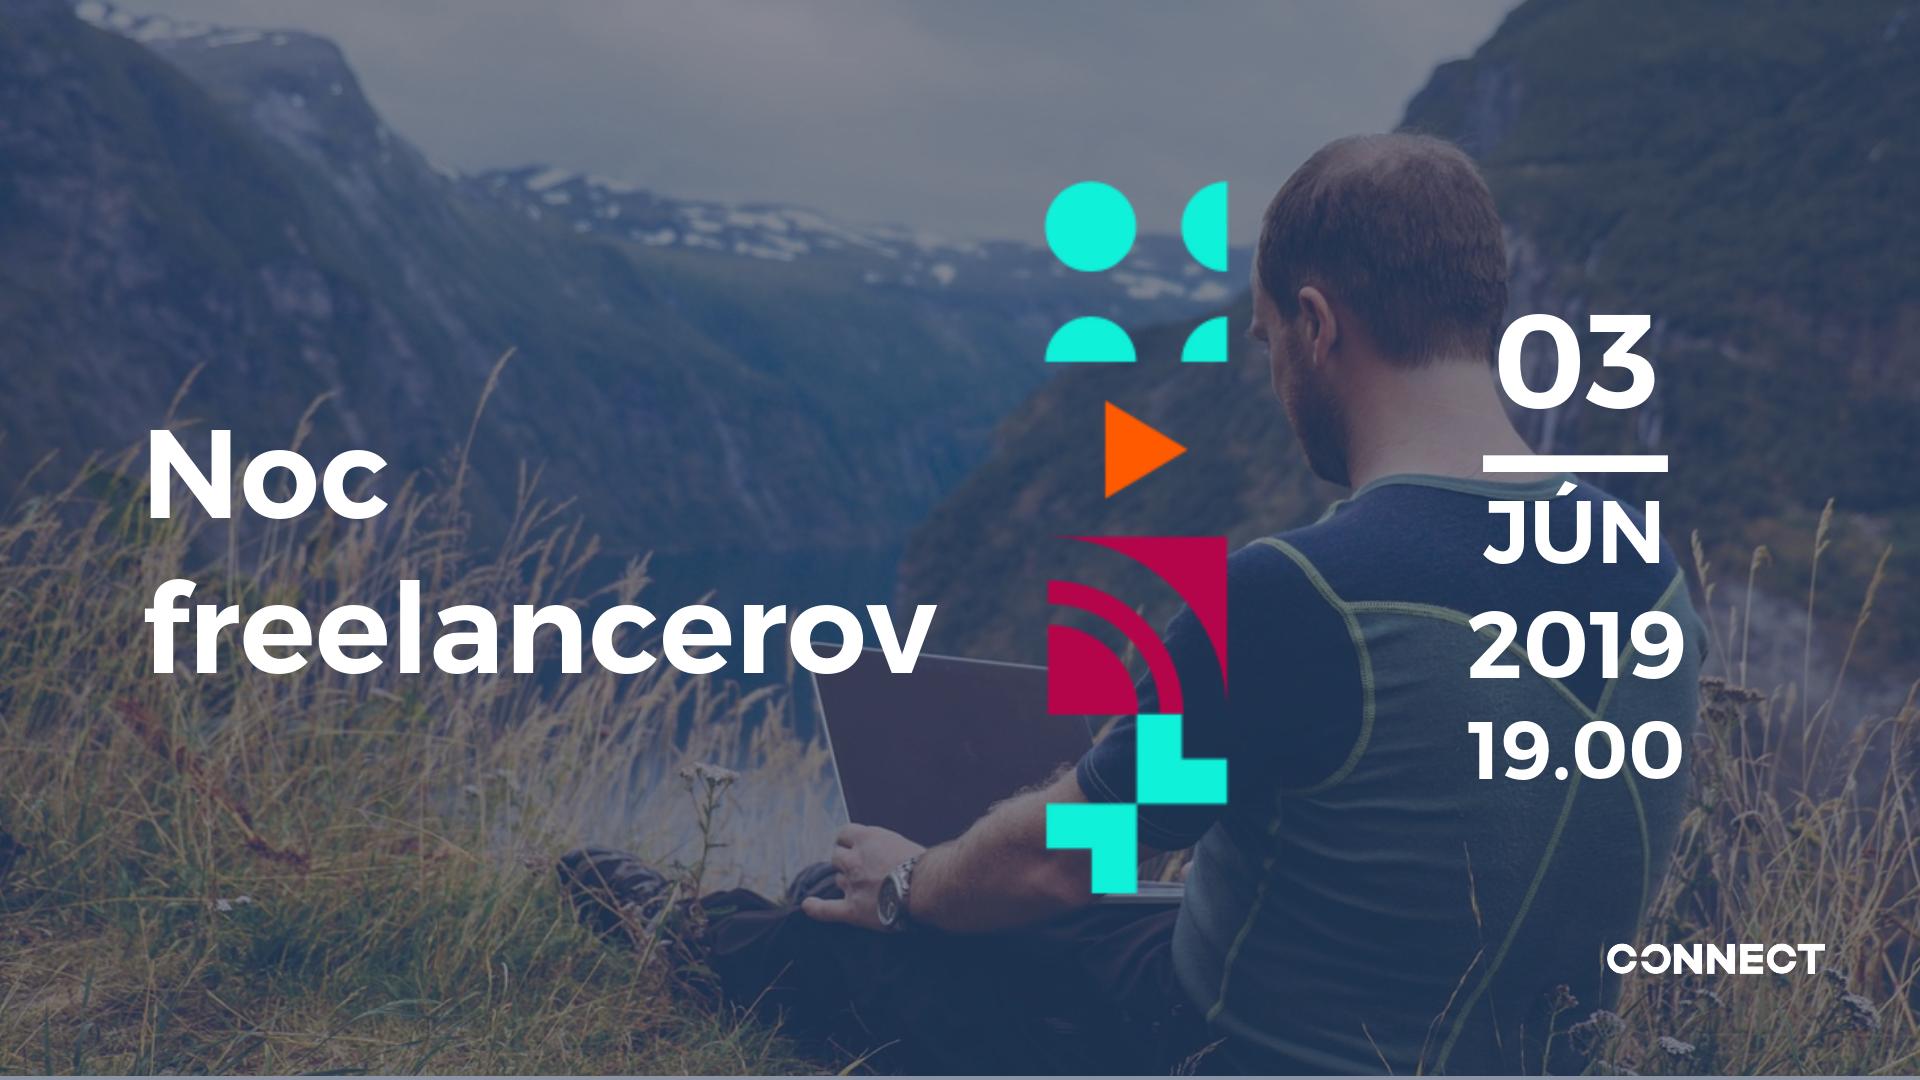 NOC freelancerov / 3.6.2019